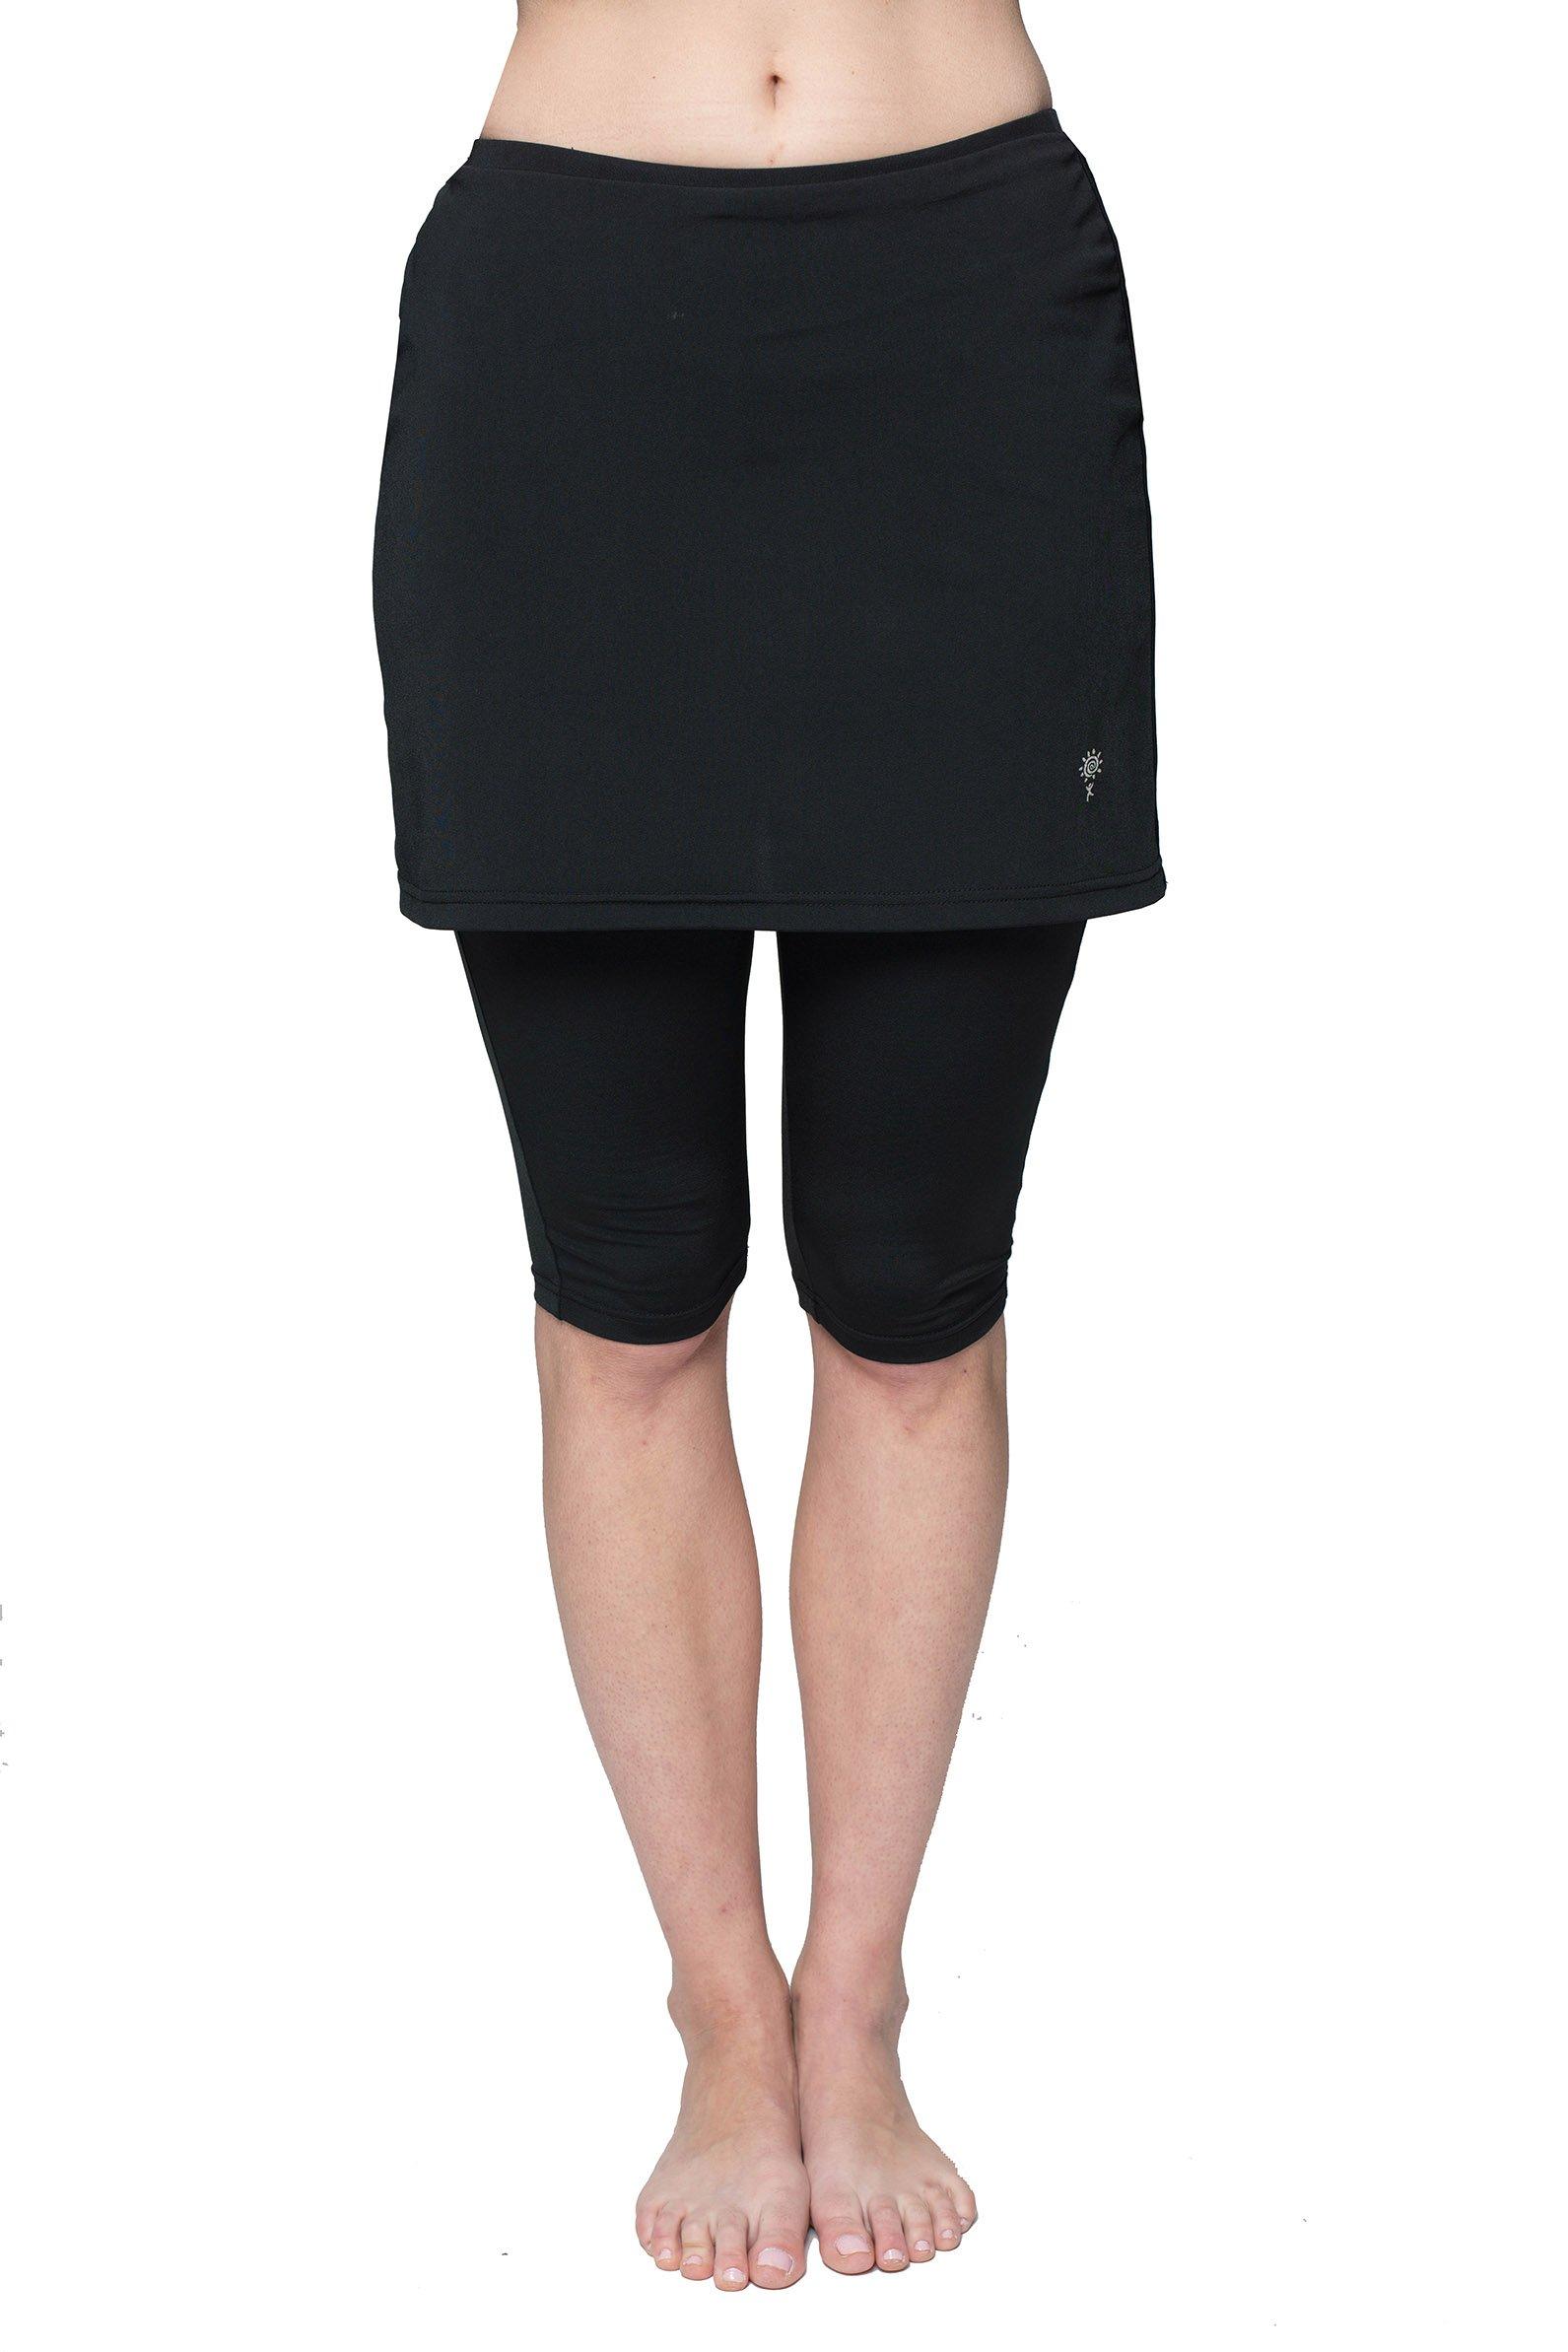 HydroChic Women's Plus Size Skirted Swim Capri Pants, Modest Swimsuit Capri Skirt (Black, 0X)